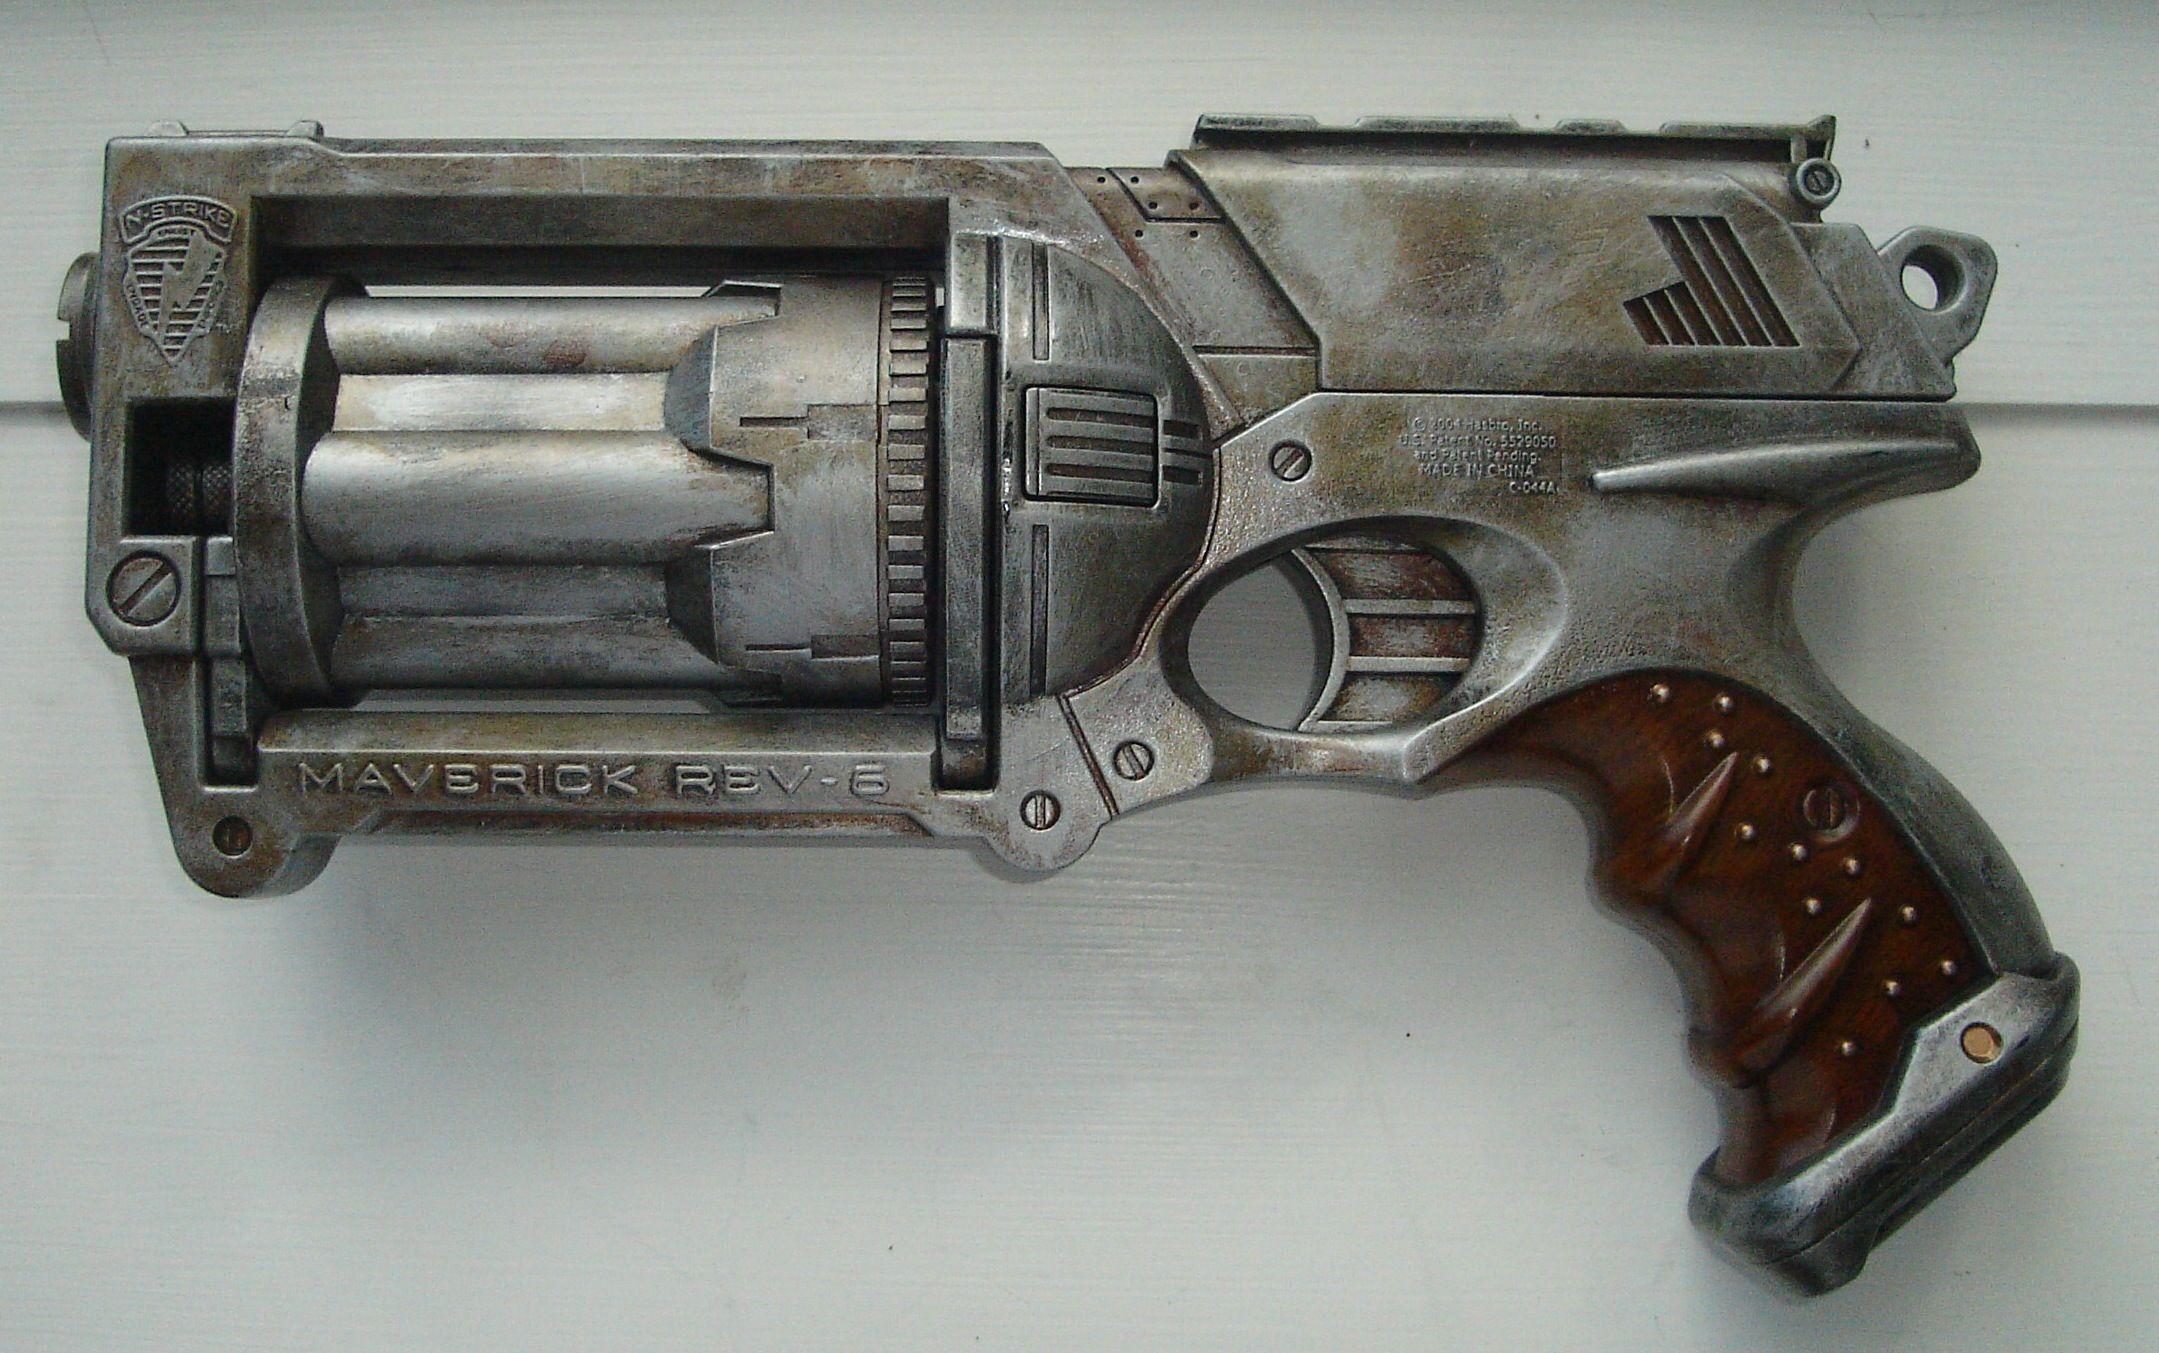 Dieselpunk Maverick nerf gun modification via Creation of a DieselPunk -  Dieselpunks